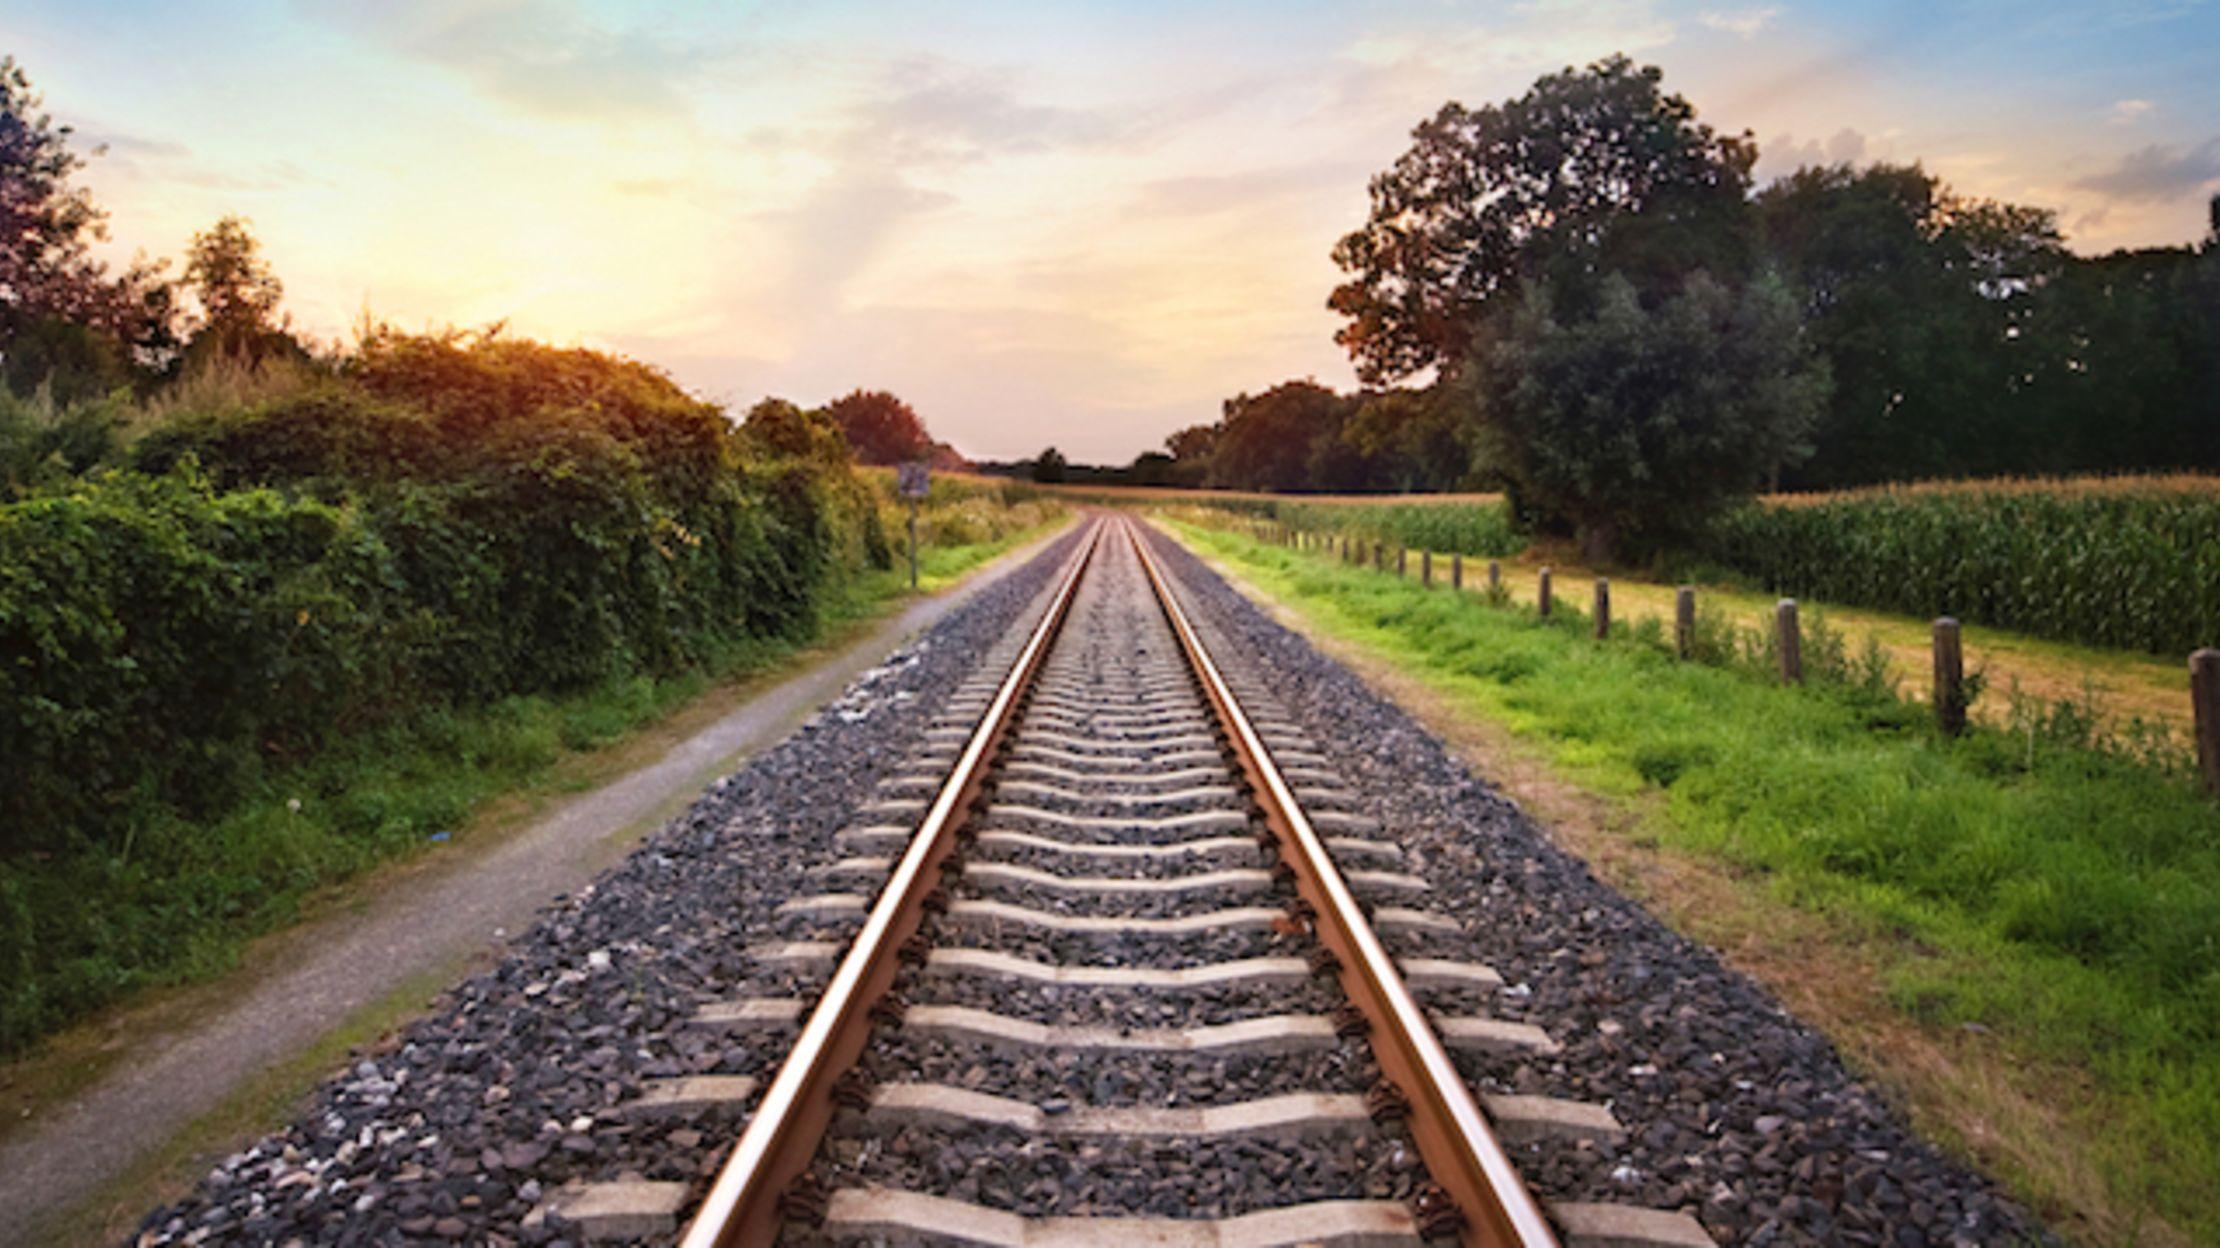 Railroad Tracks Picture | Free Photograph | Photos Public